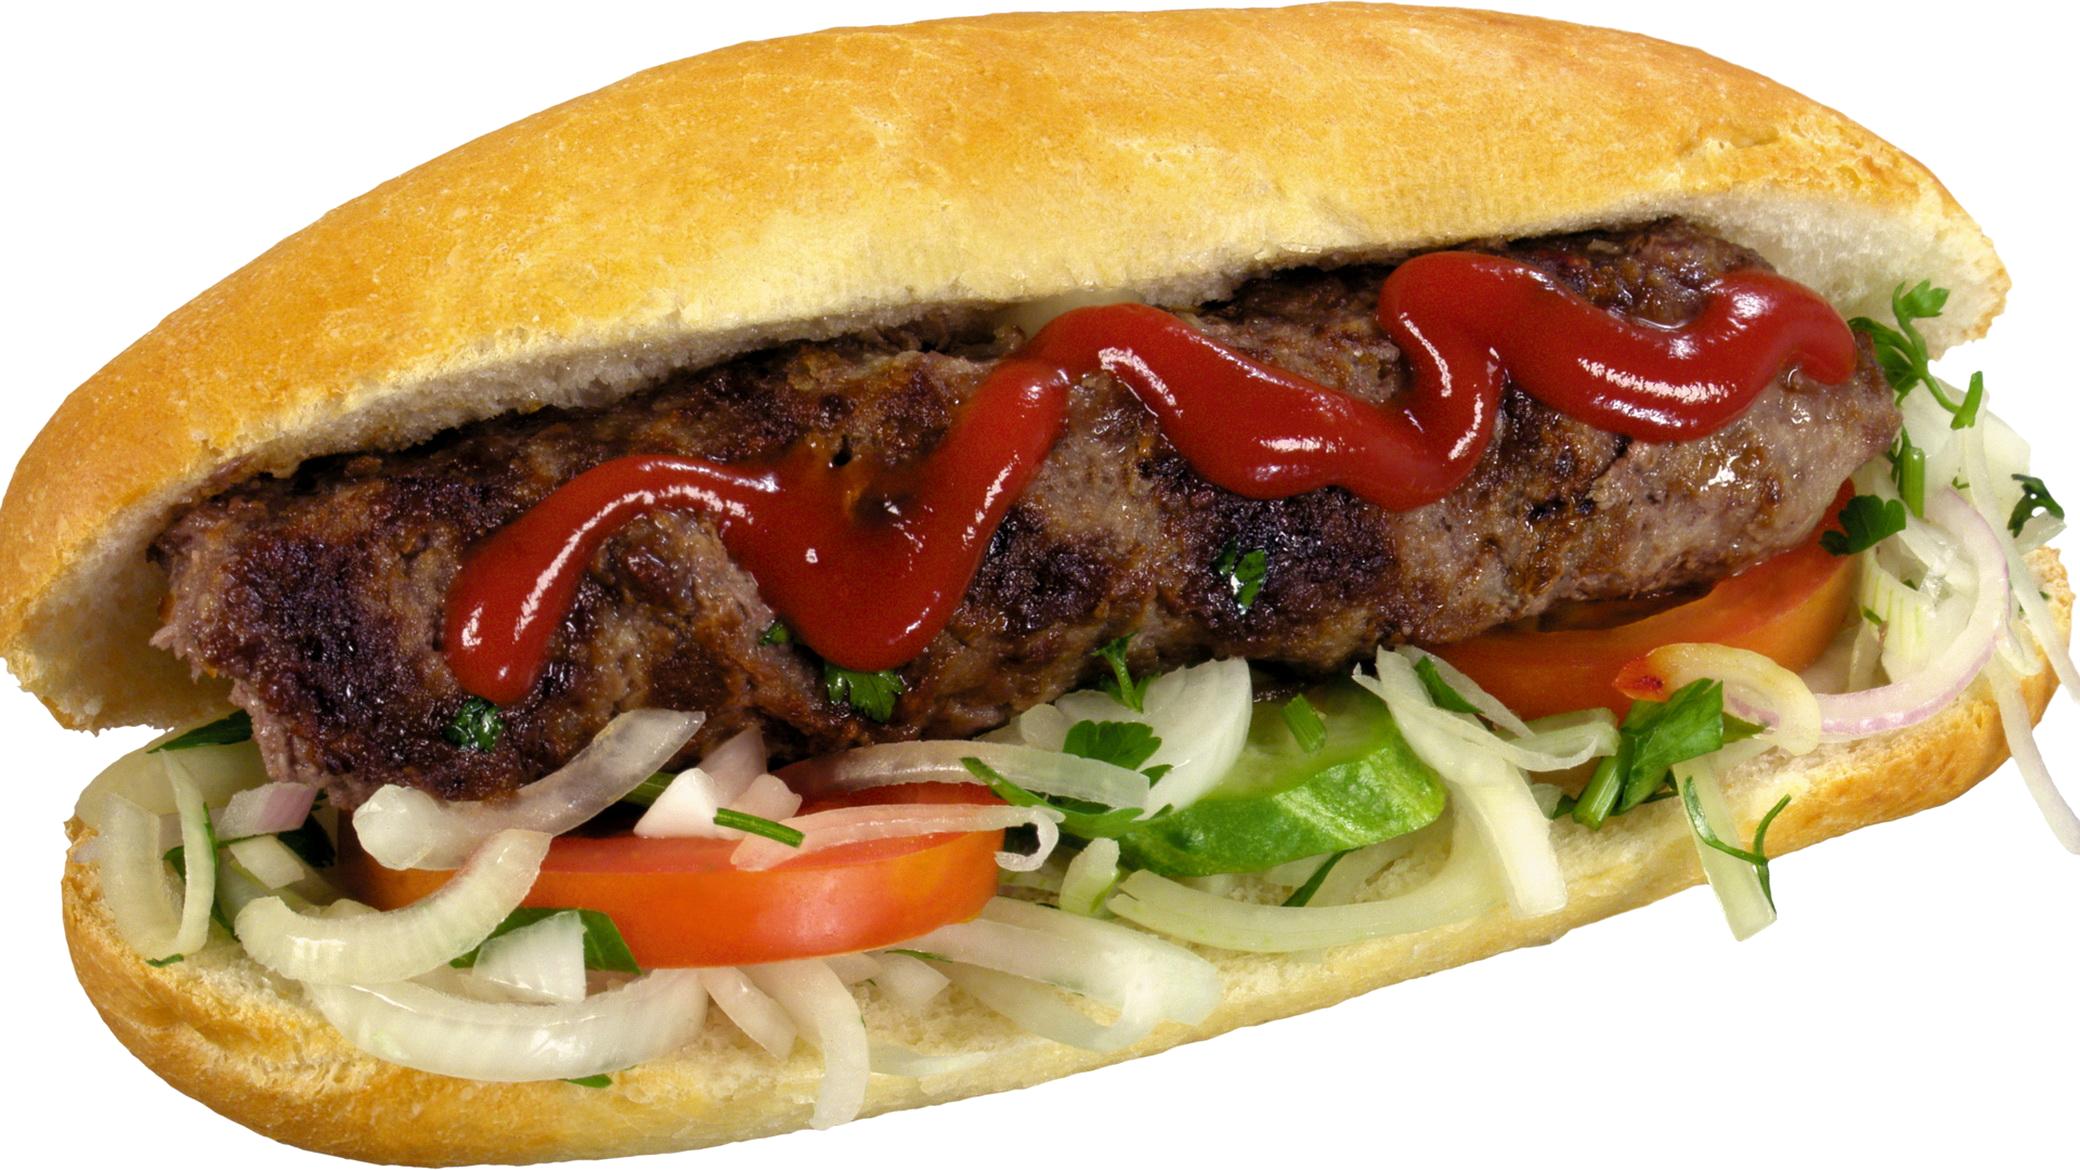 Hot Dog Png Image Dog Food Recipes Food Hot Dogs